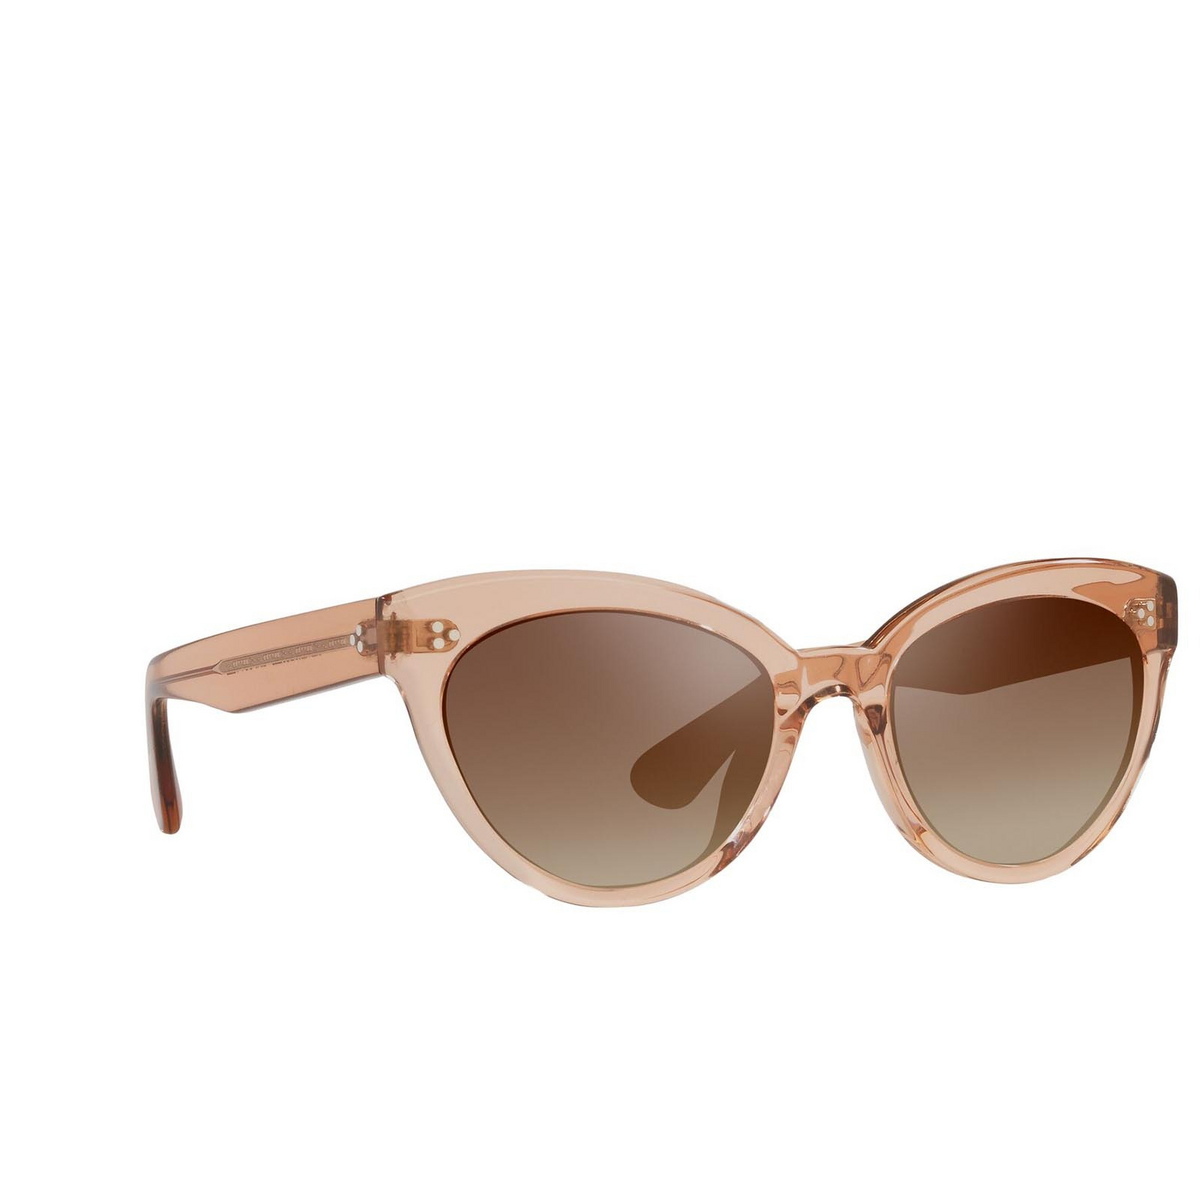 Oliver Peoples® Cat-eye Sunglasses: Roella OV5355SU color Pink 1471Q1 - three-quarters view.